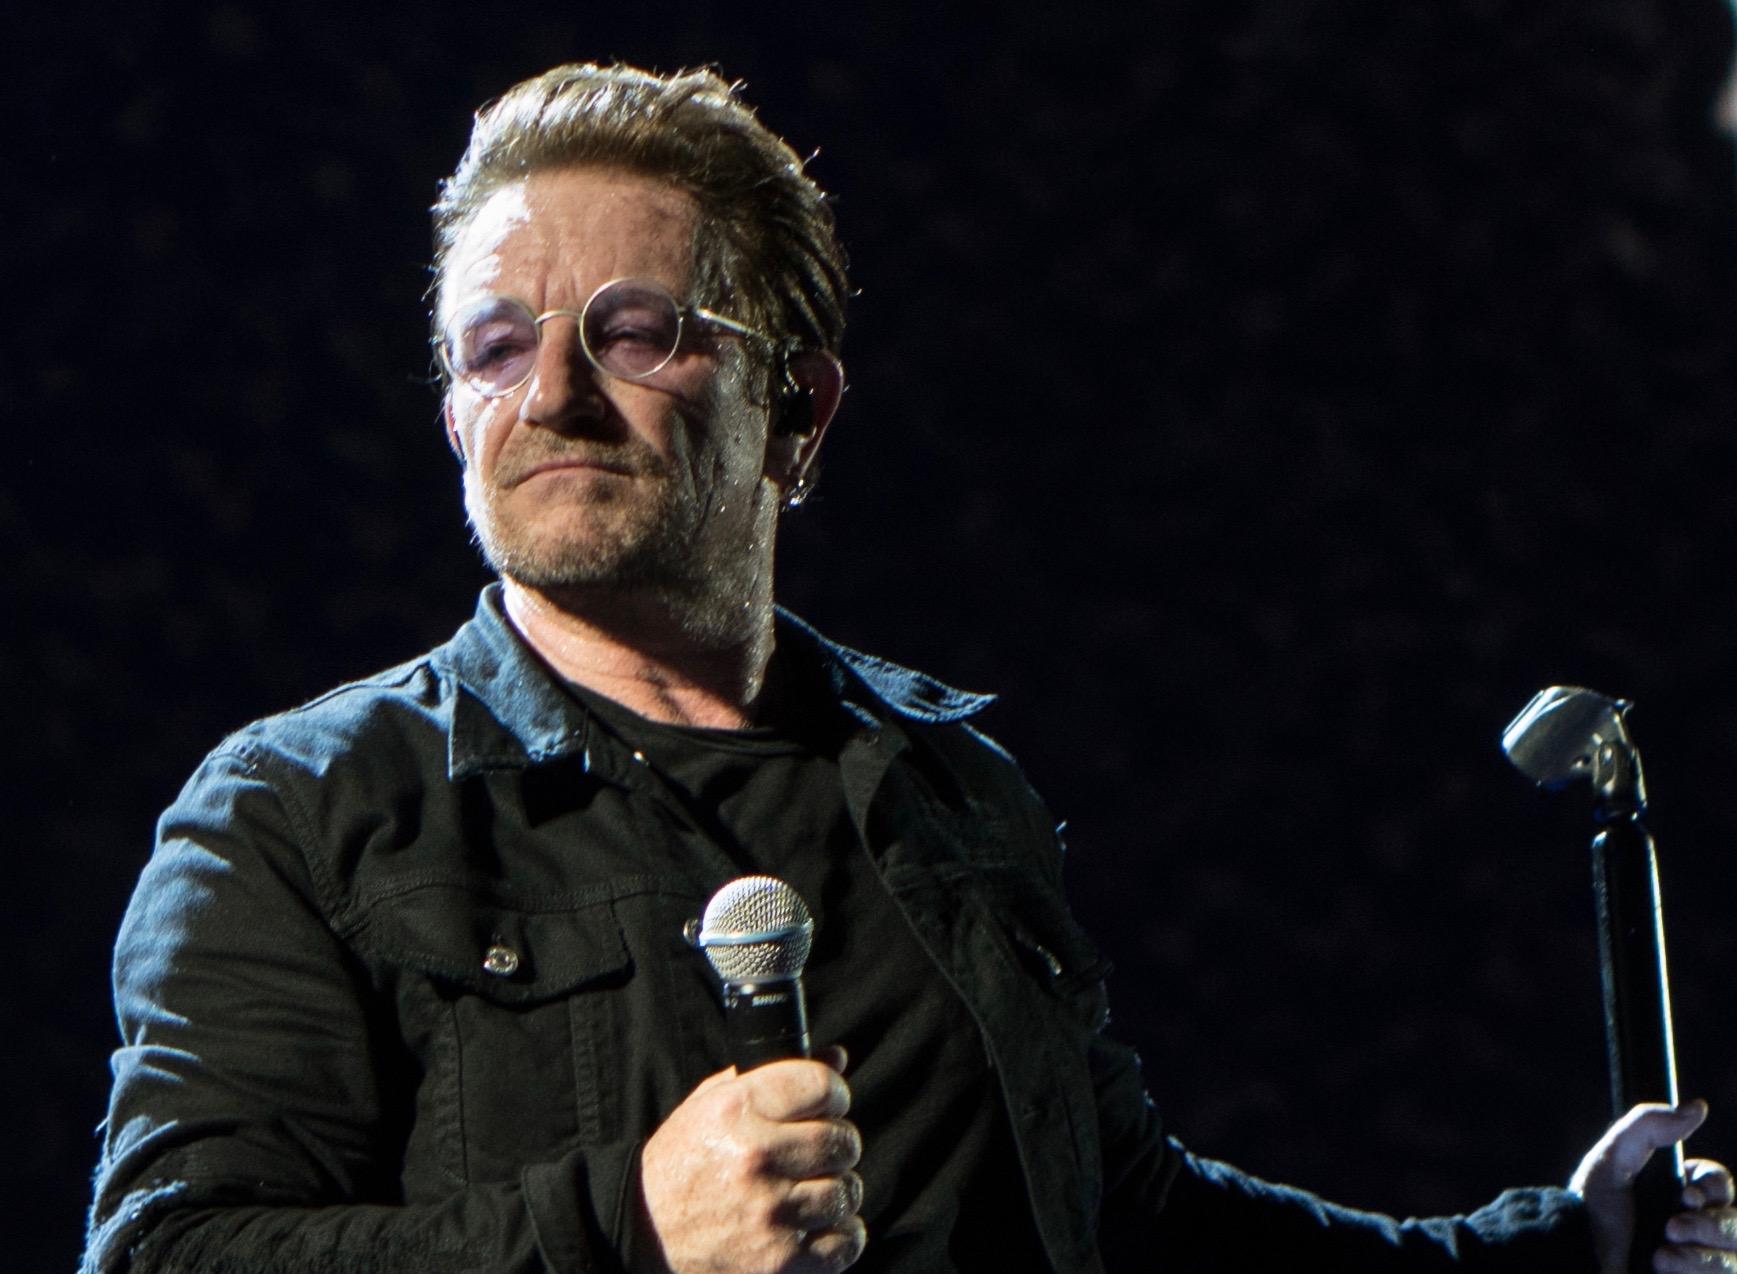 Bono_in_Miami_on_June_11_2017_on_Joshua_Tree_Tour_2017 2.jpg